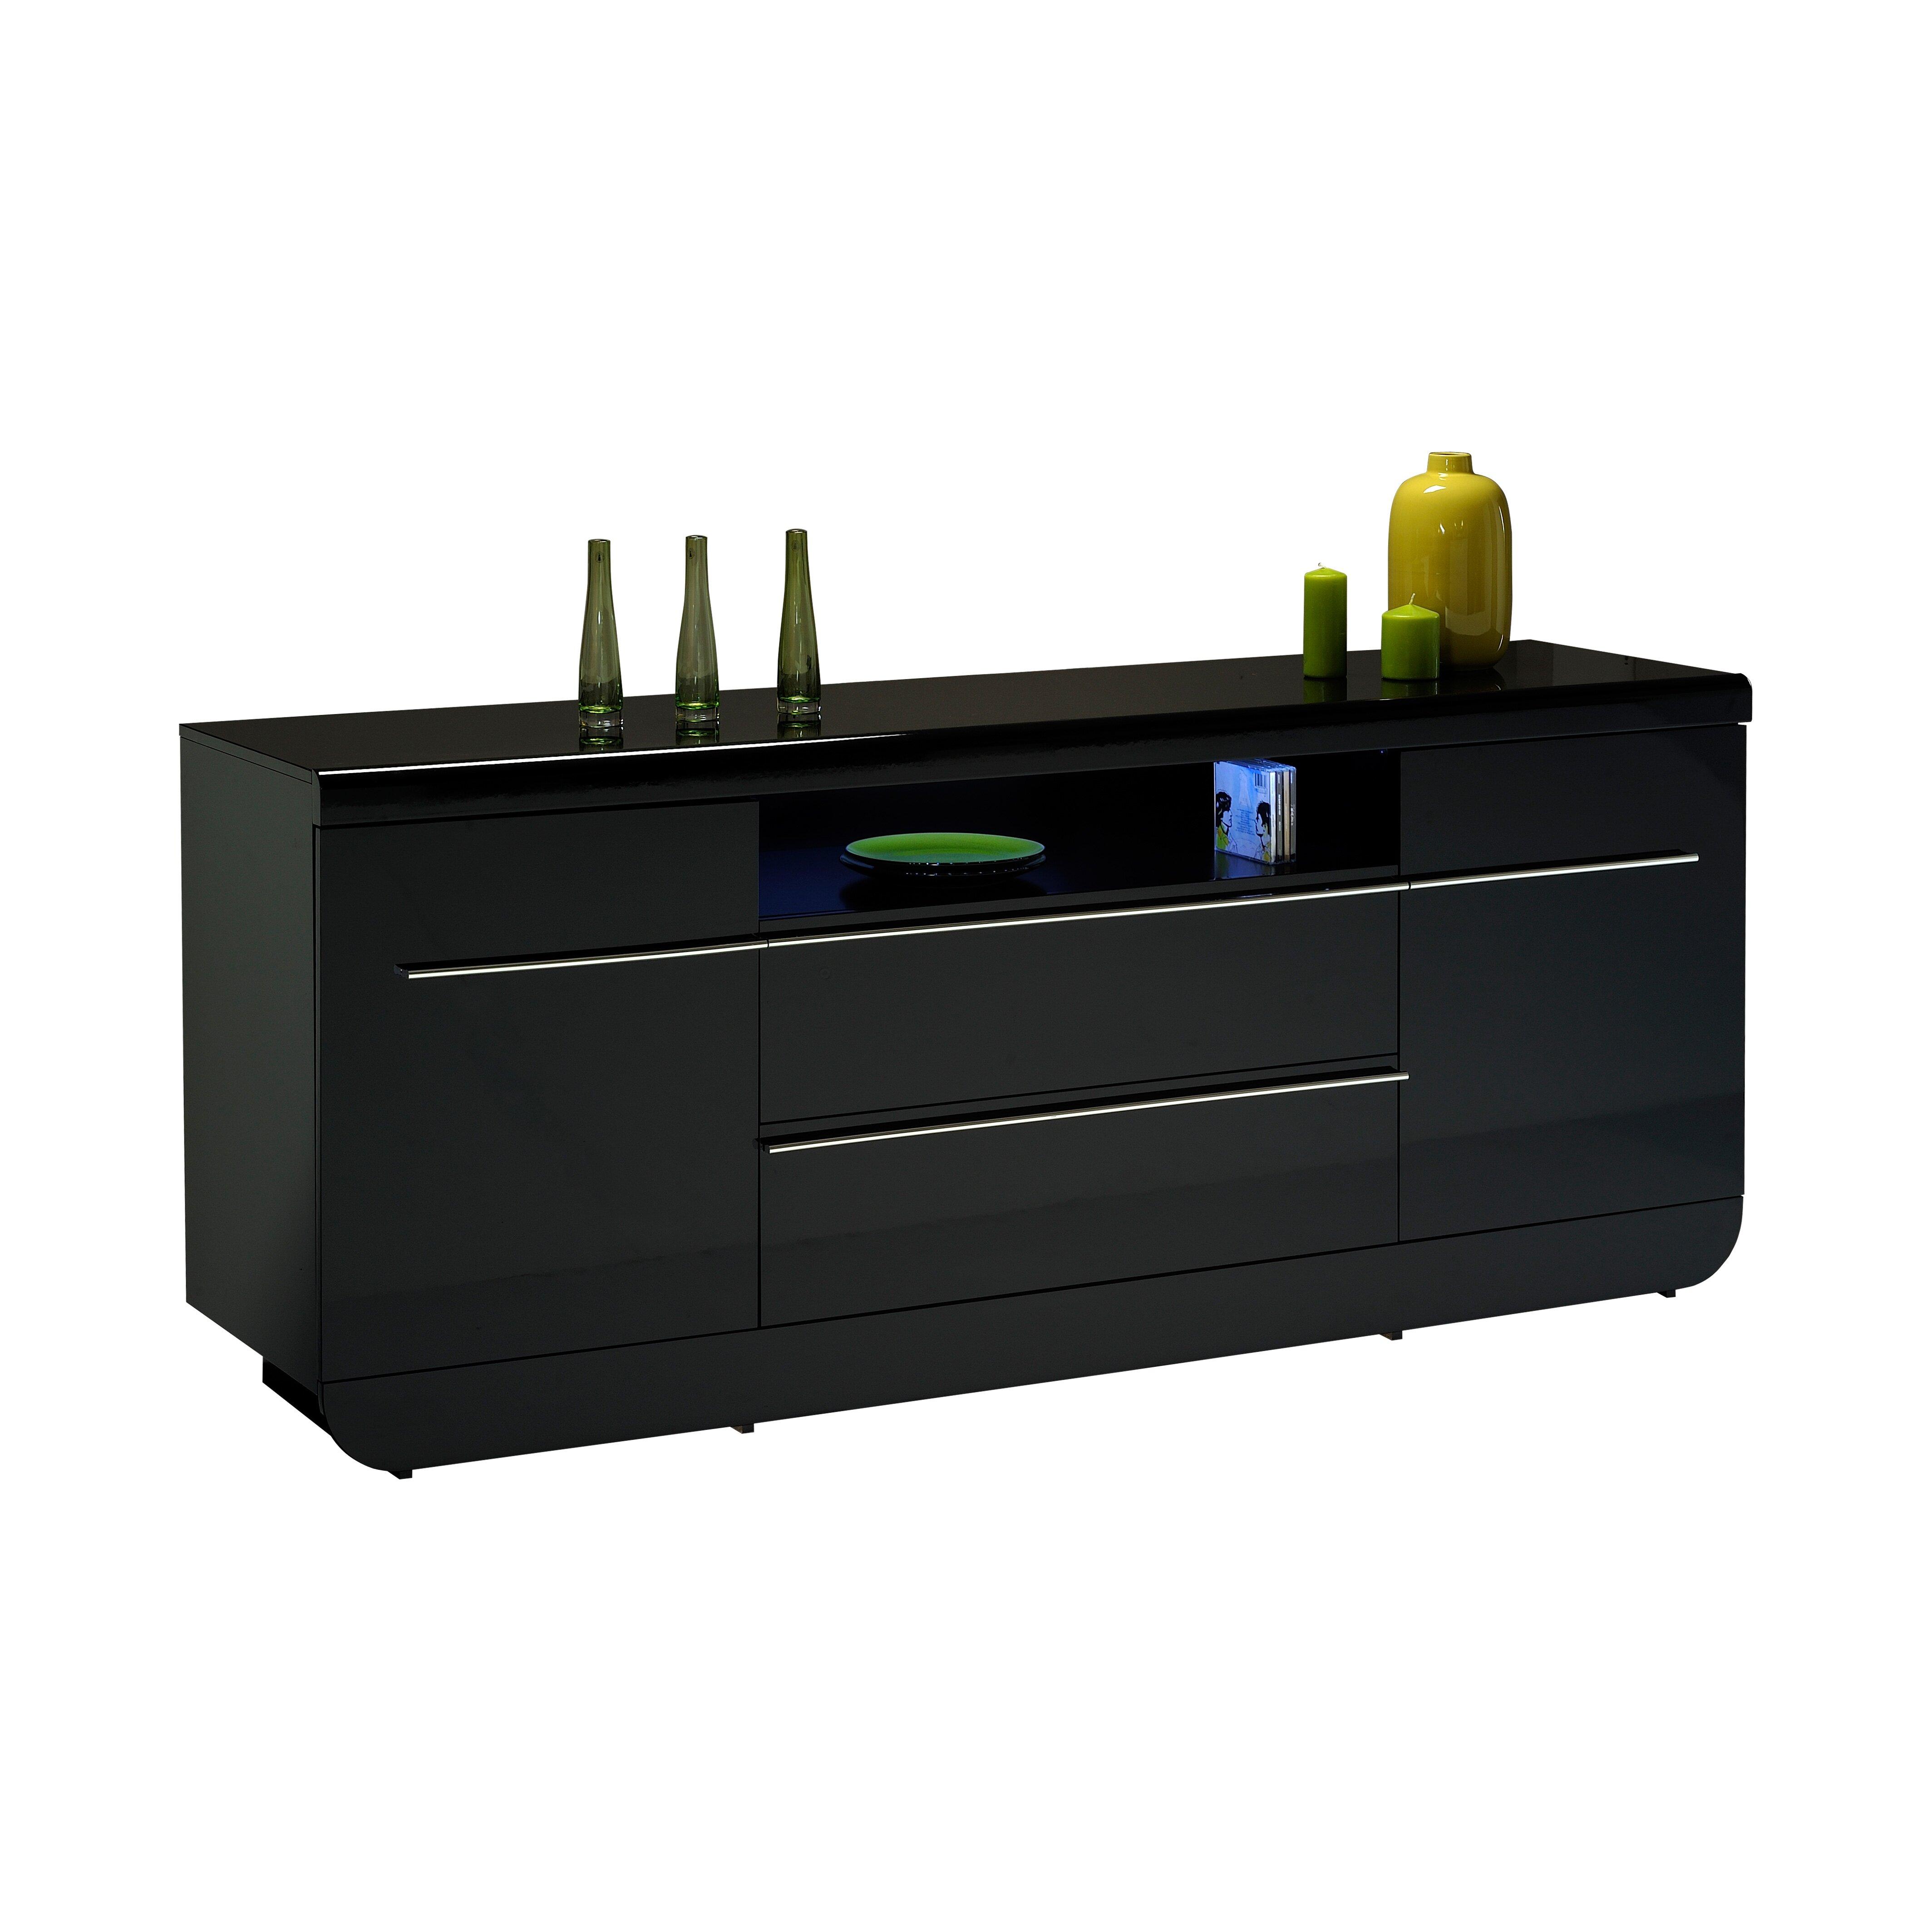 urban designs annfield 2 door 2 drawer sideboard reviews wayfair uk. Black Bedroom Furniture Sets. Home Design Ideas